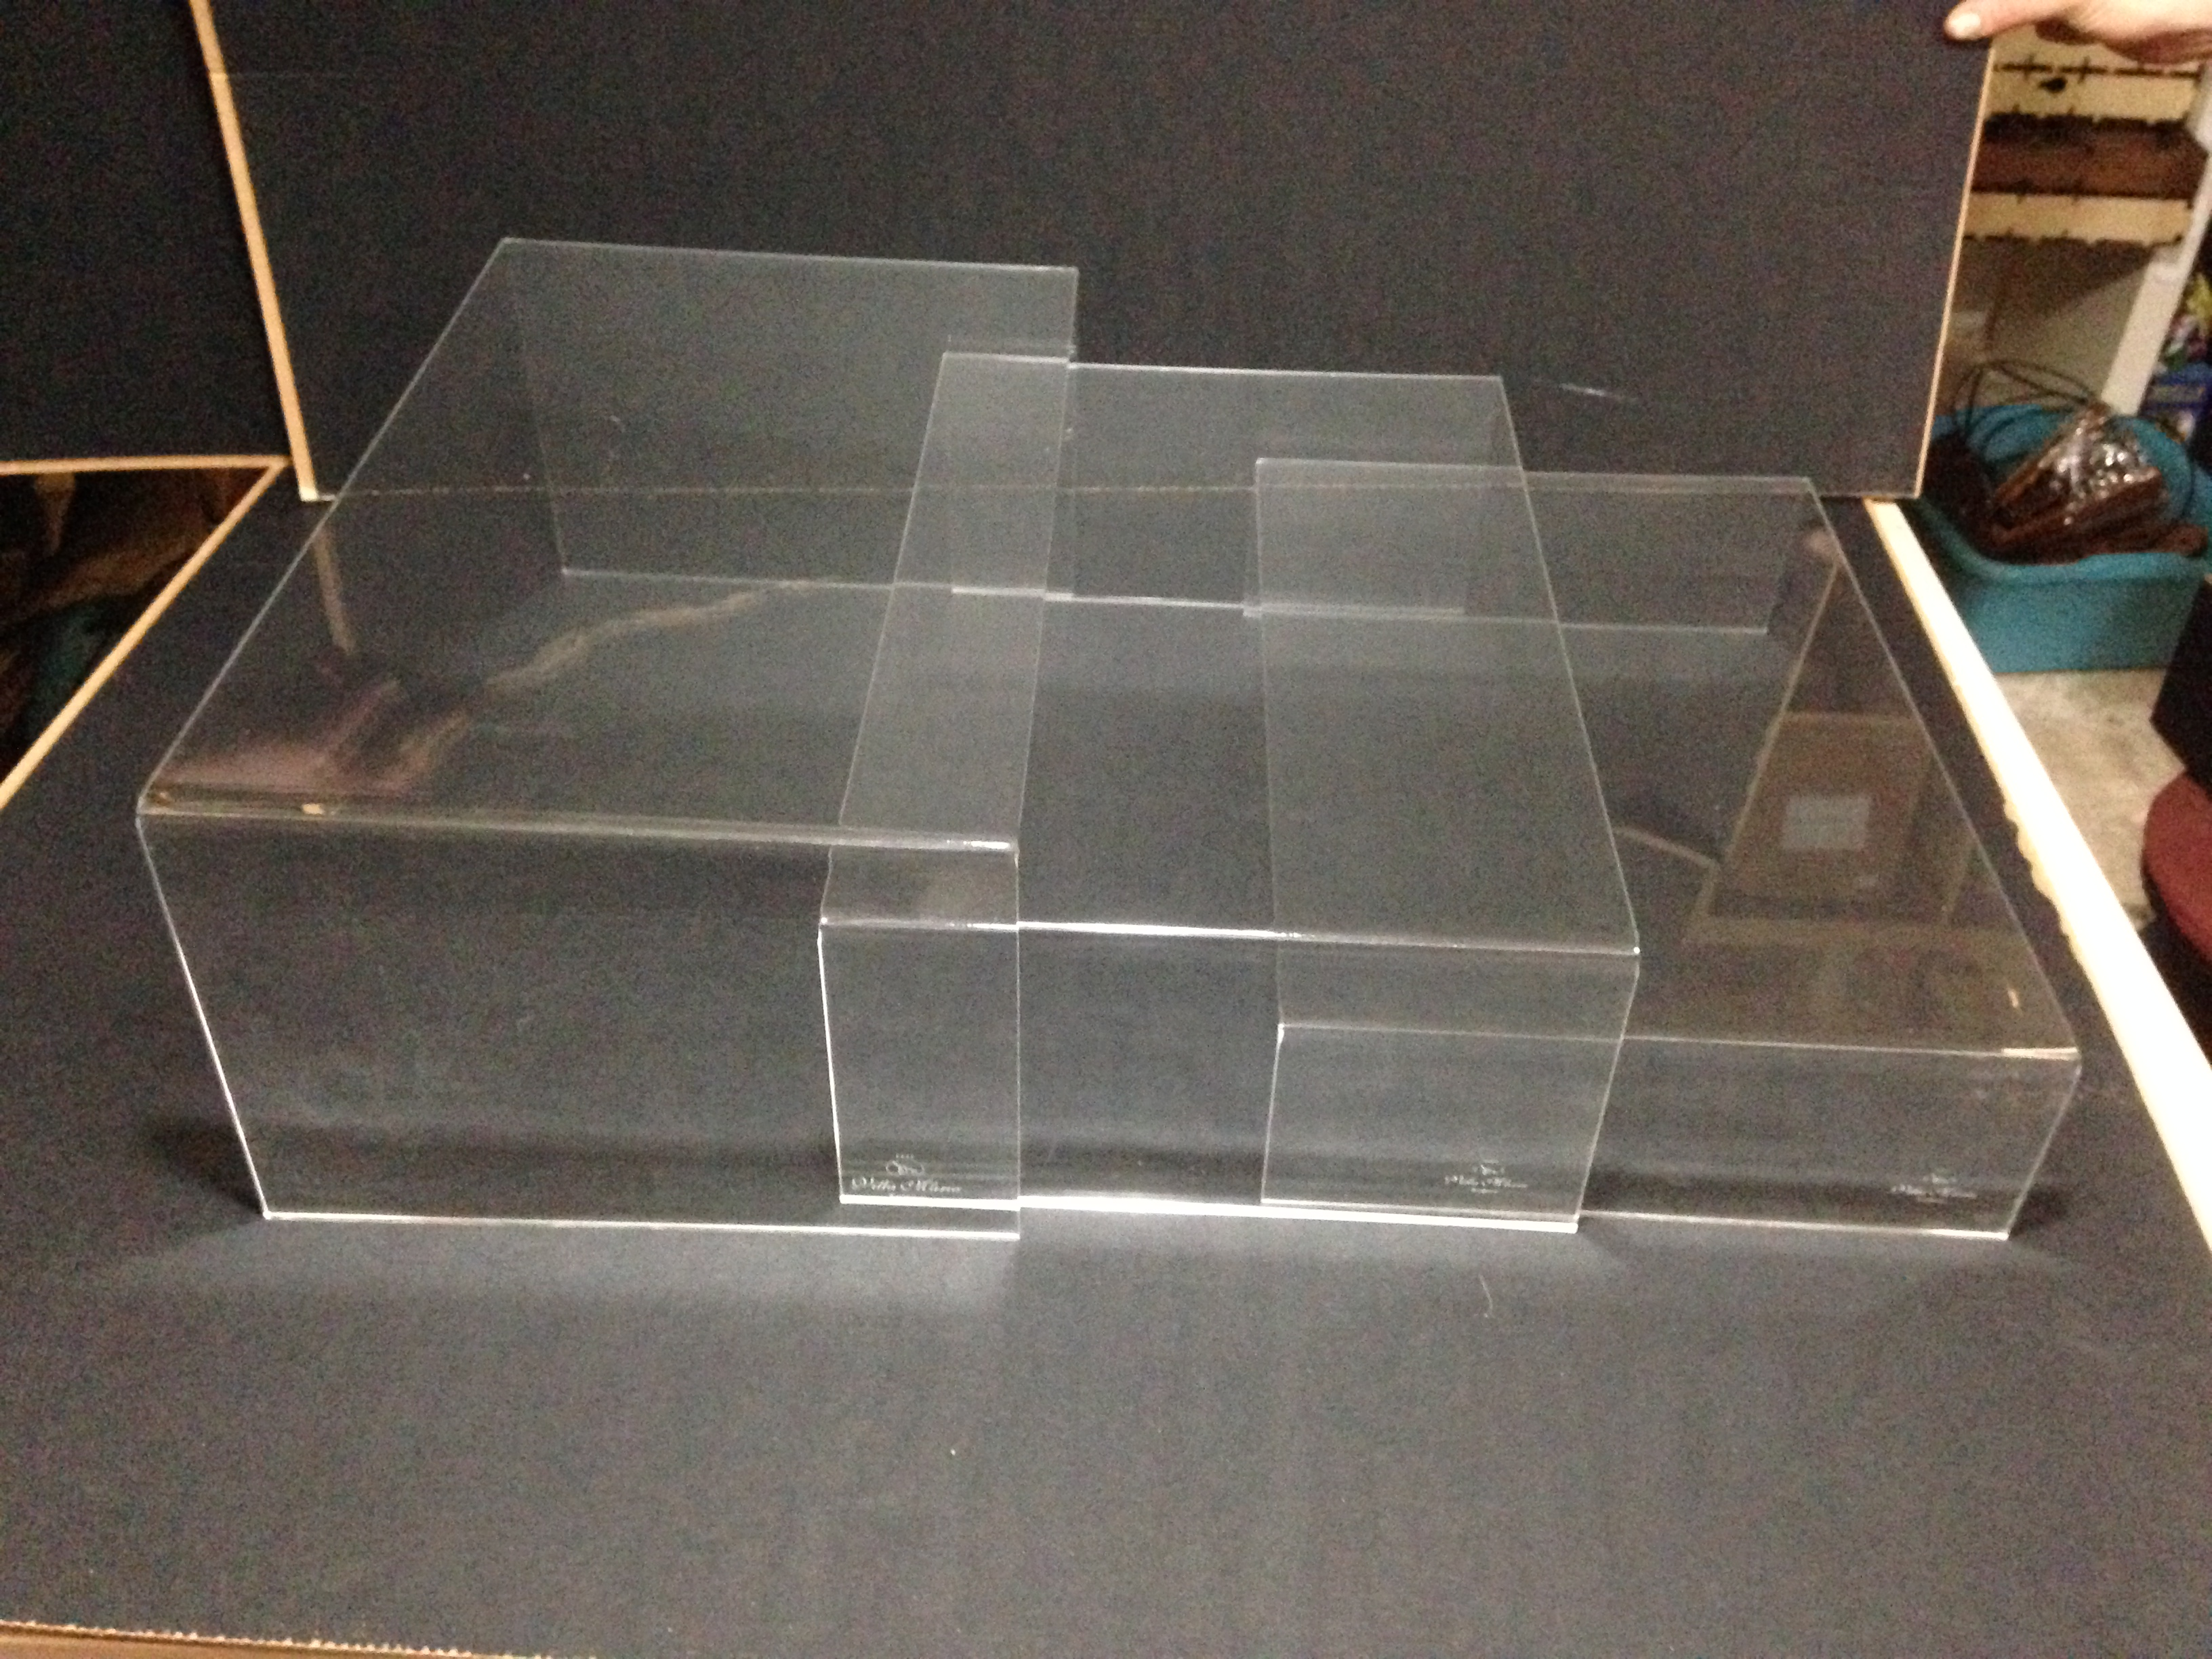 Display per catering in plexiglas